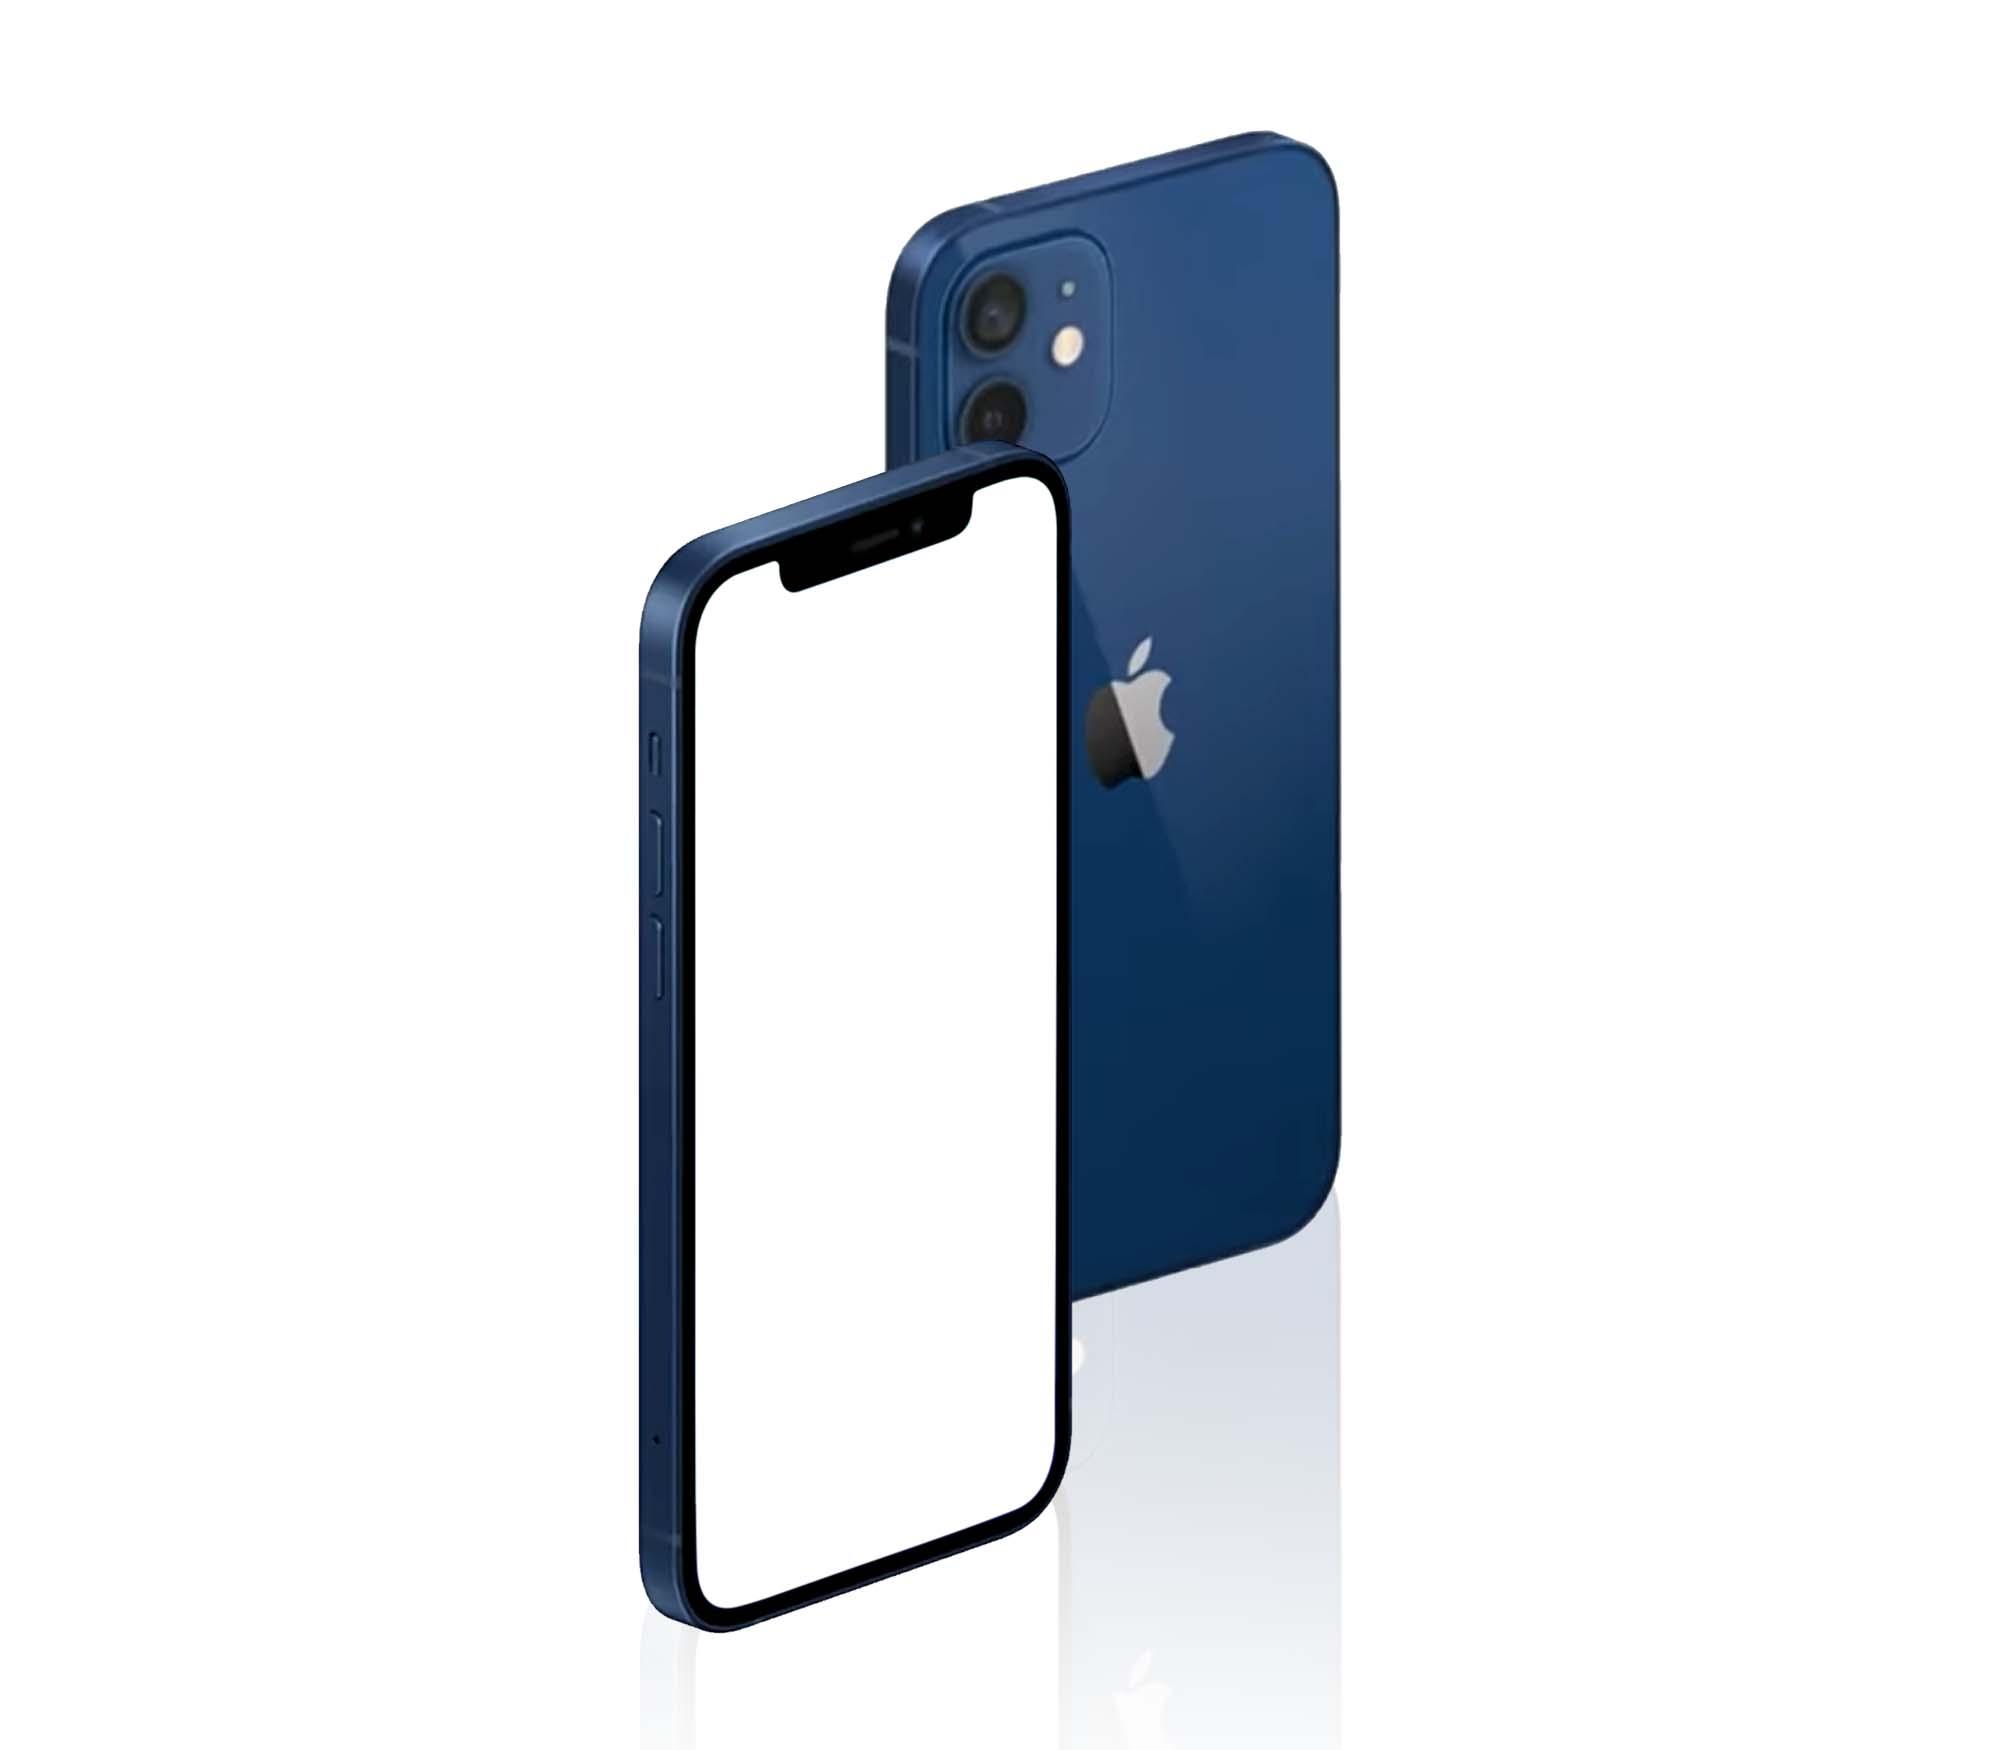 iPhone 12 Mockup 6